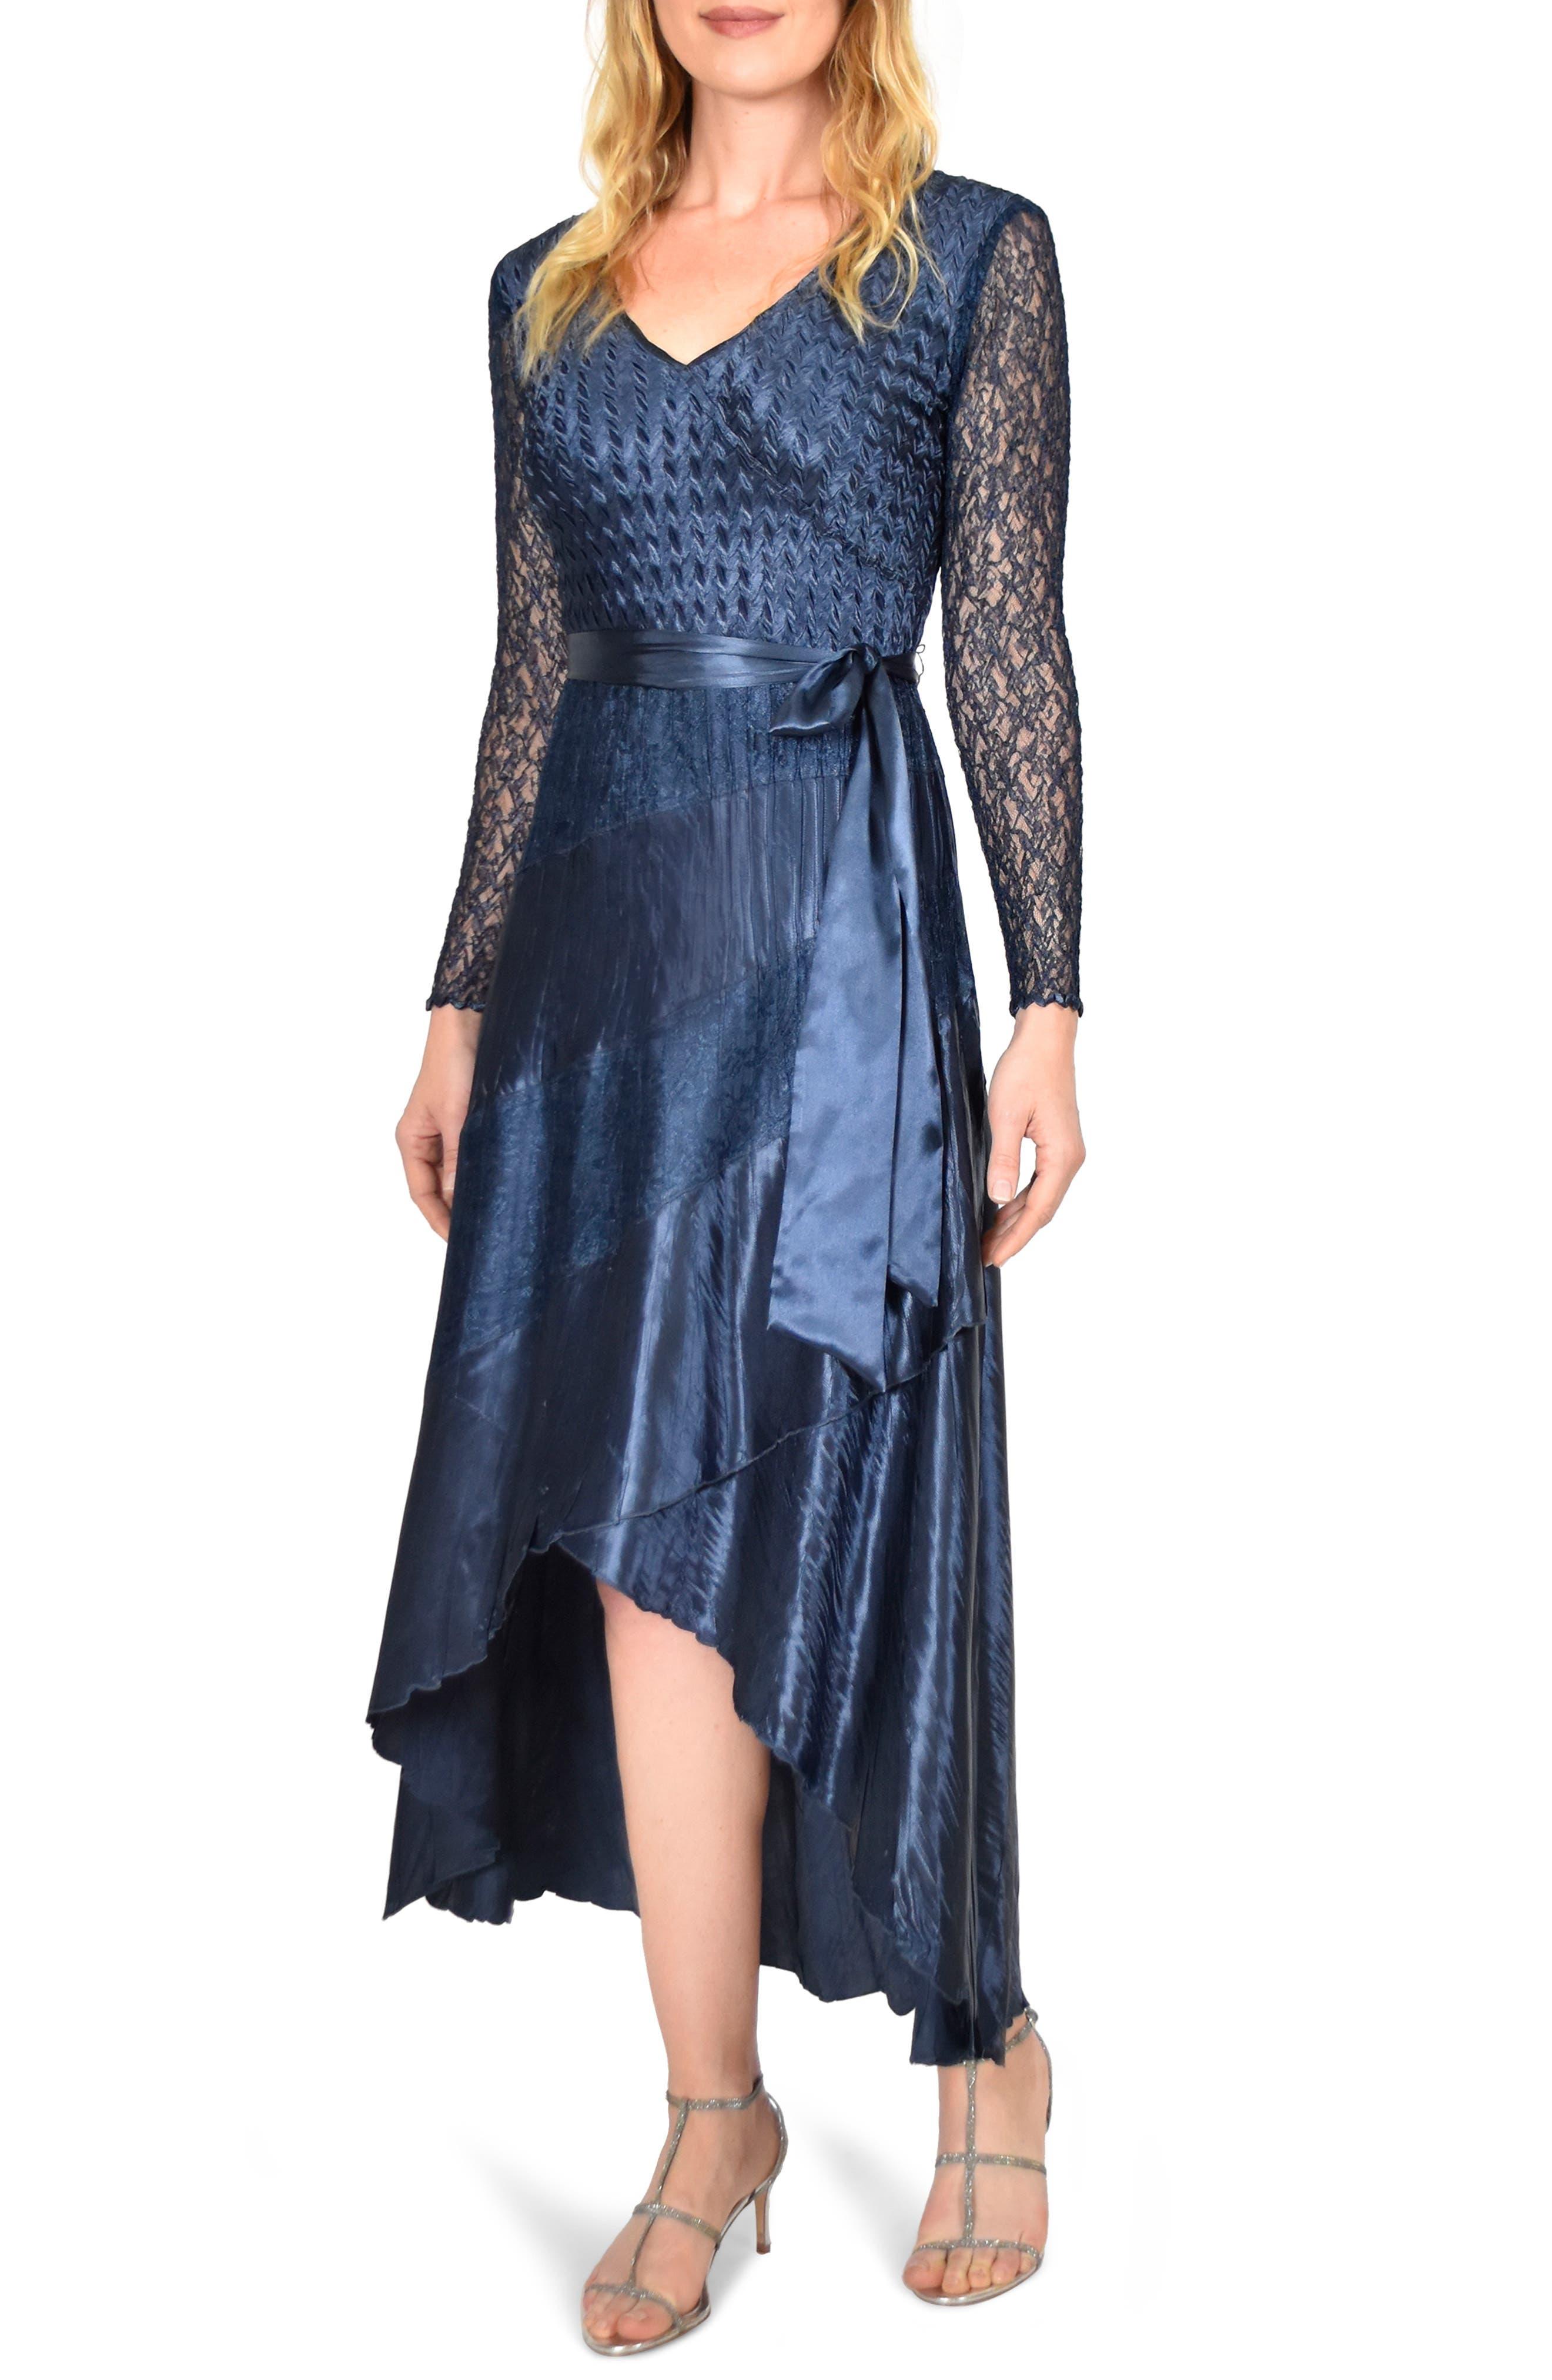 KOMAROV Charmeuse & Chiffon High/Low Hem Dress, Main, color, ECLIPSE